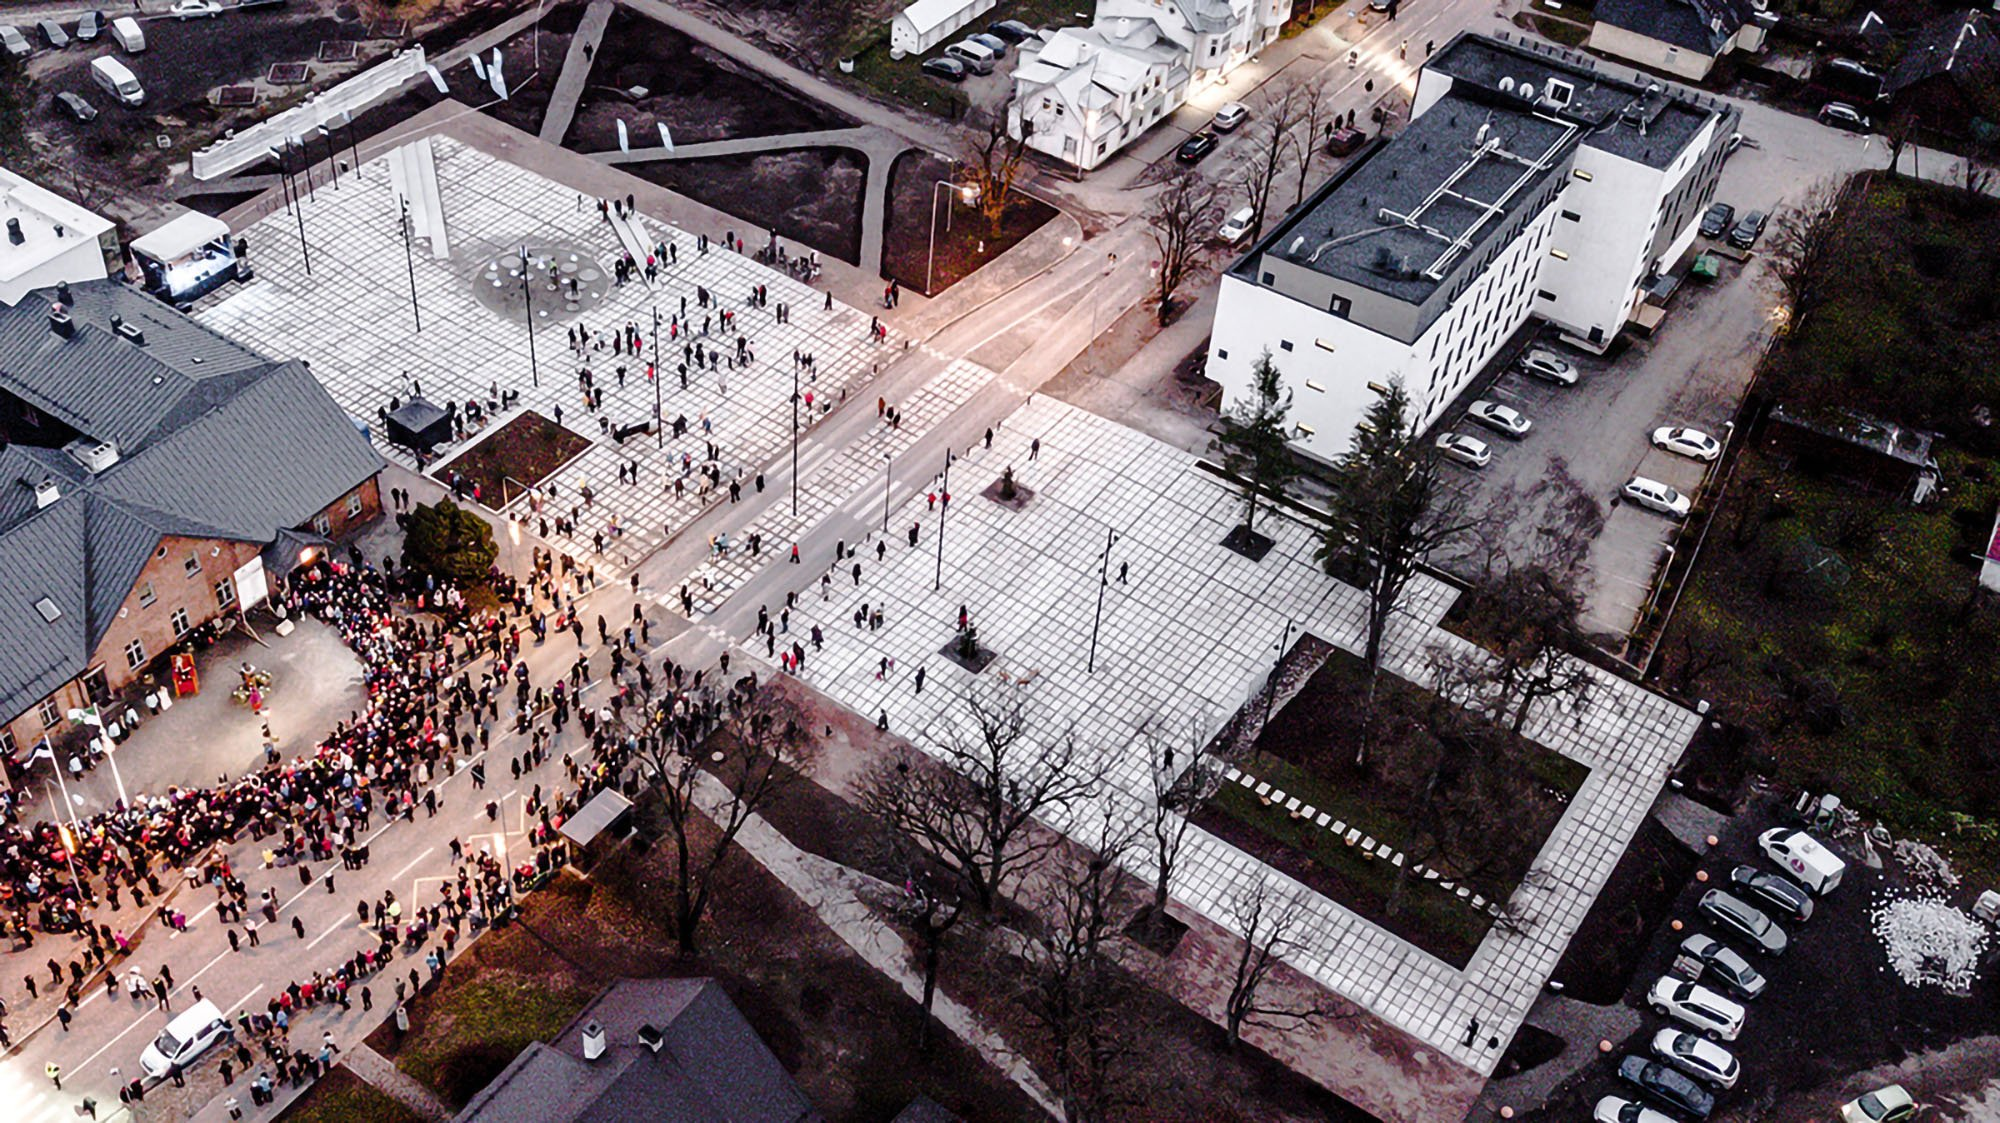 06_Rapla piazza centrale ©Siim Solman